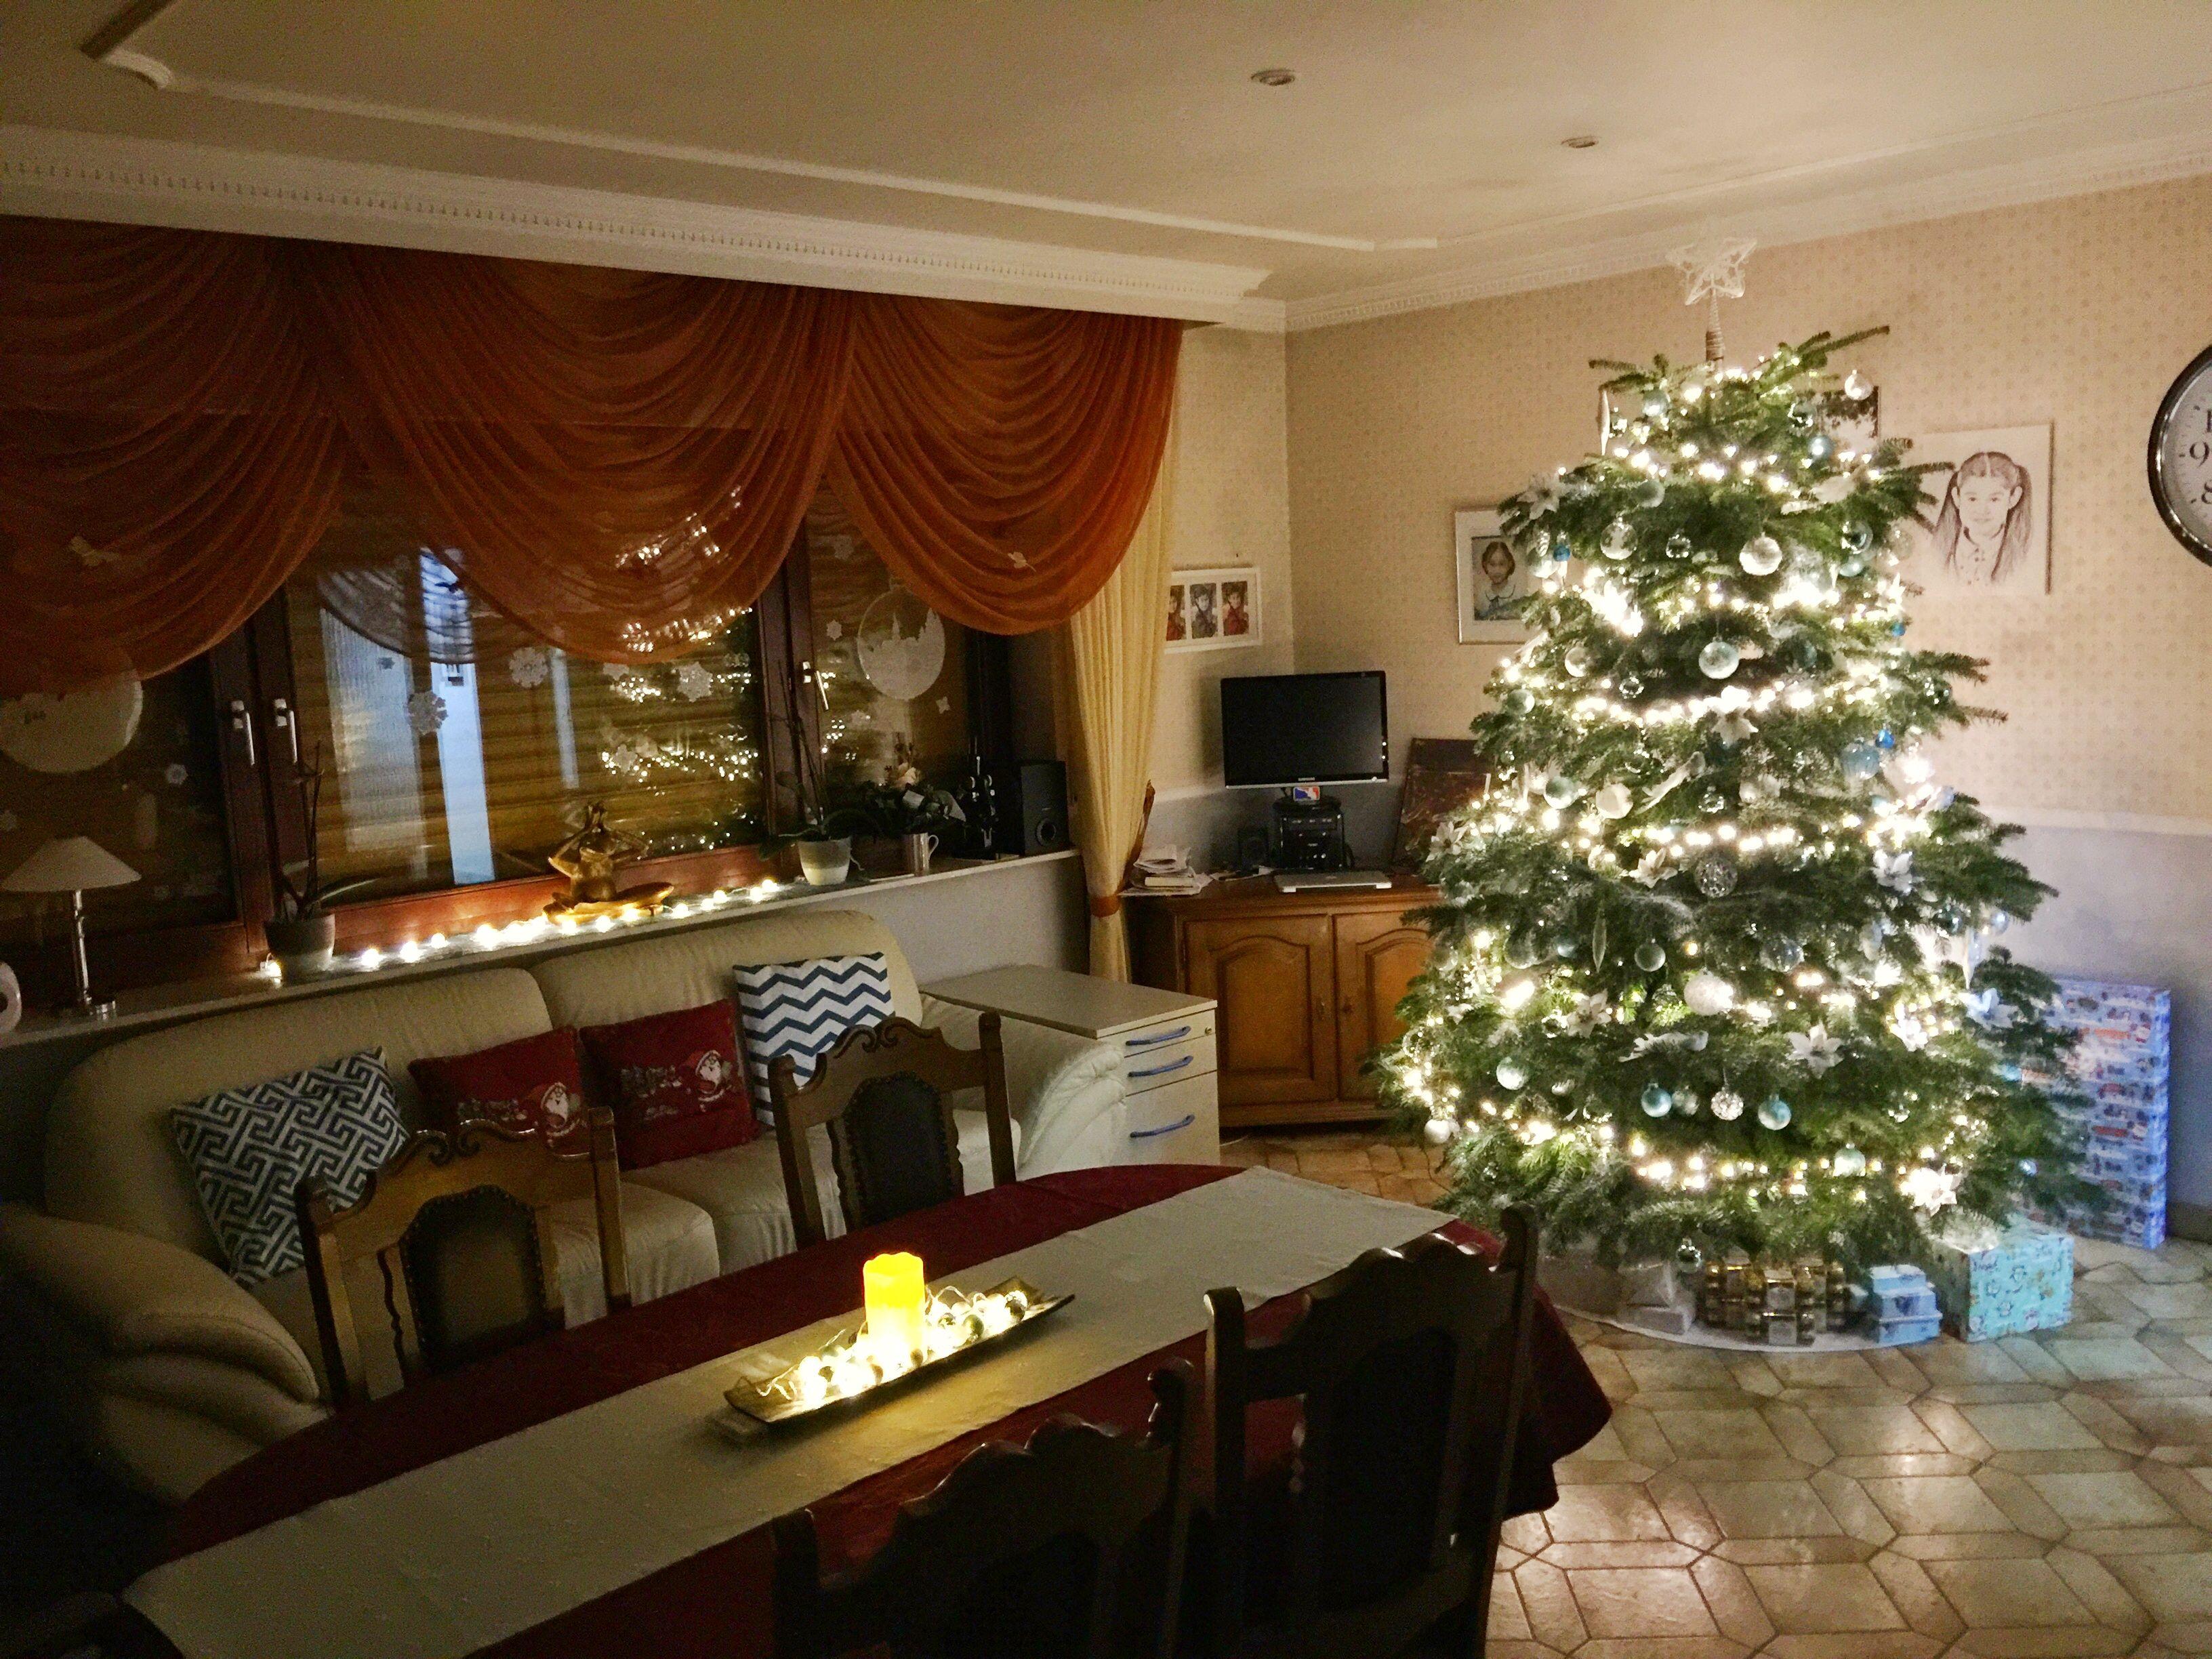 Merry Christmas! #ChristmasFeels #ChristmasSmells